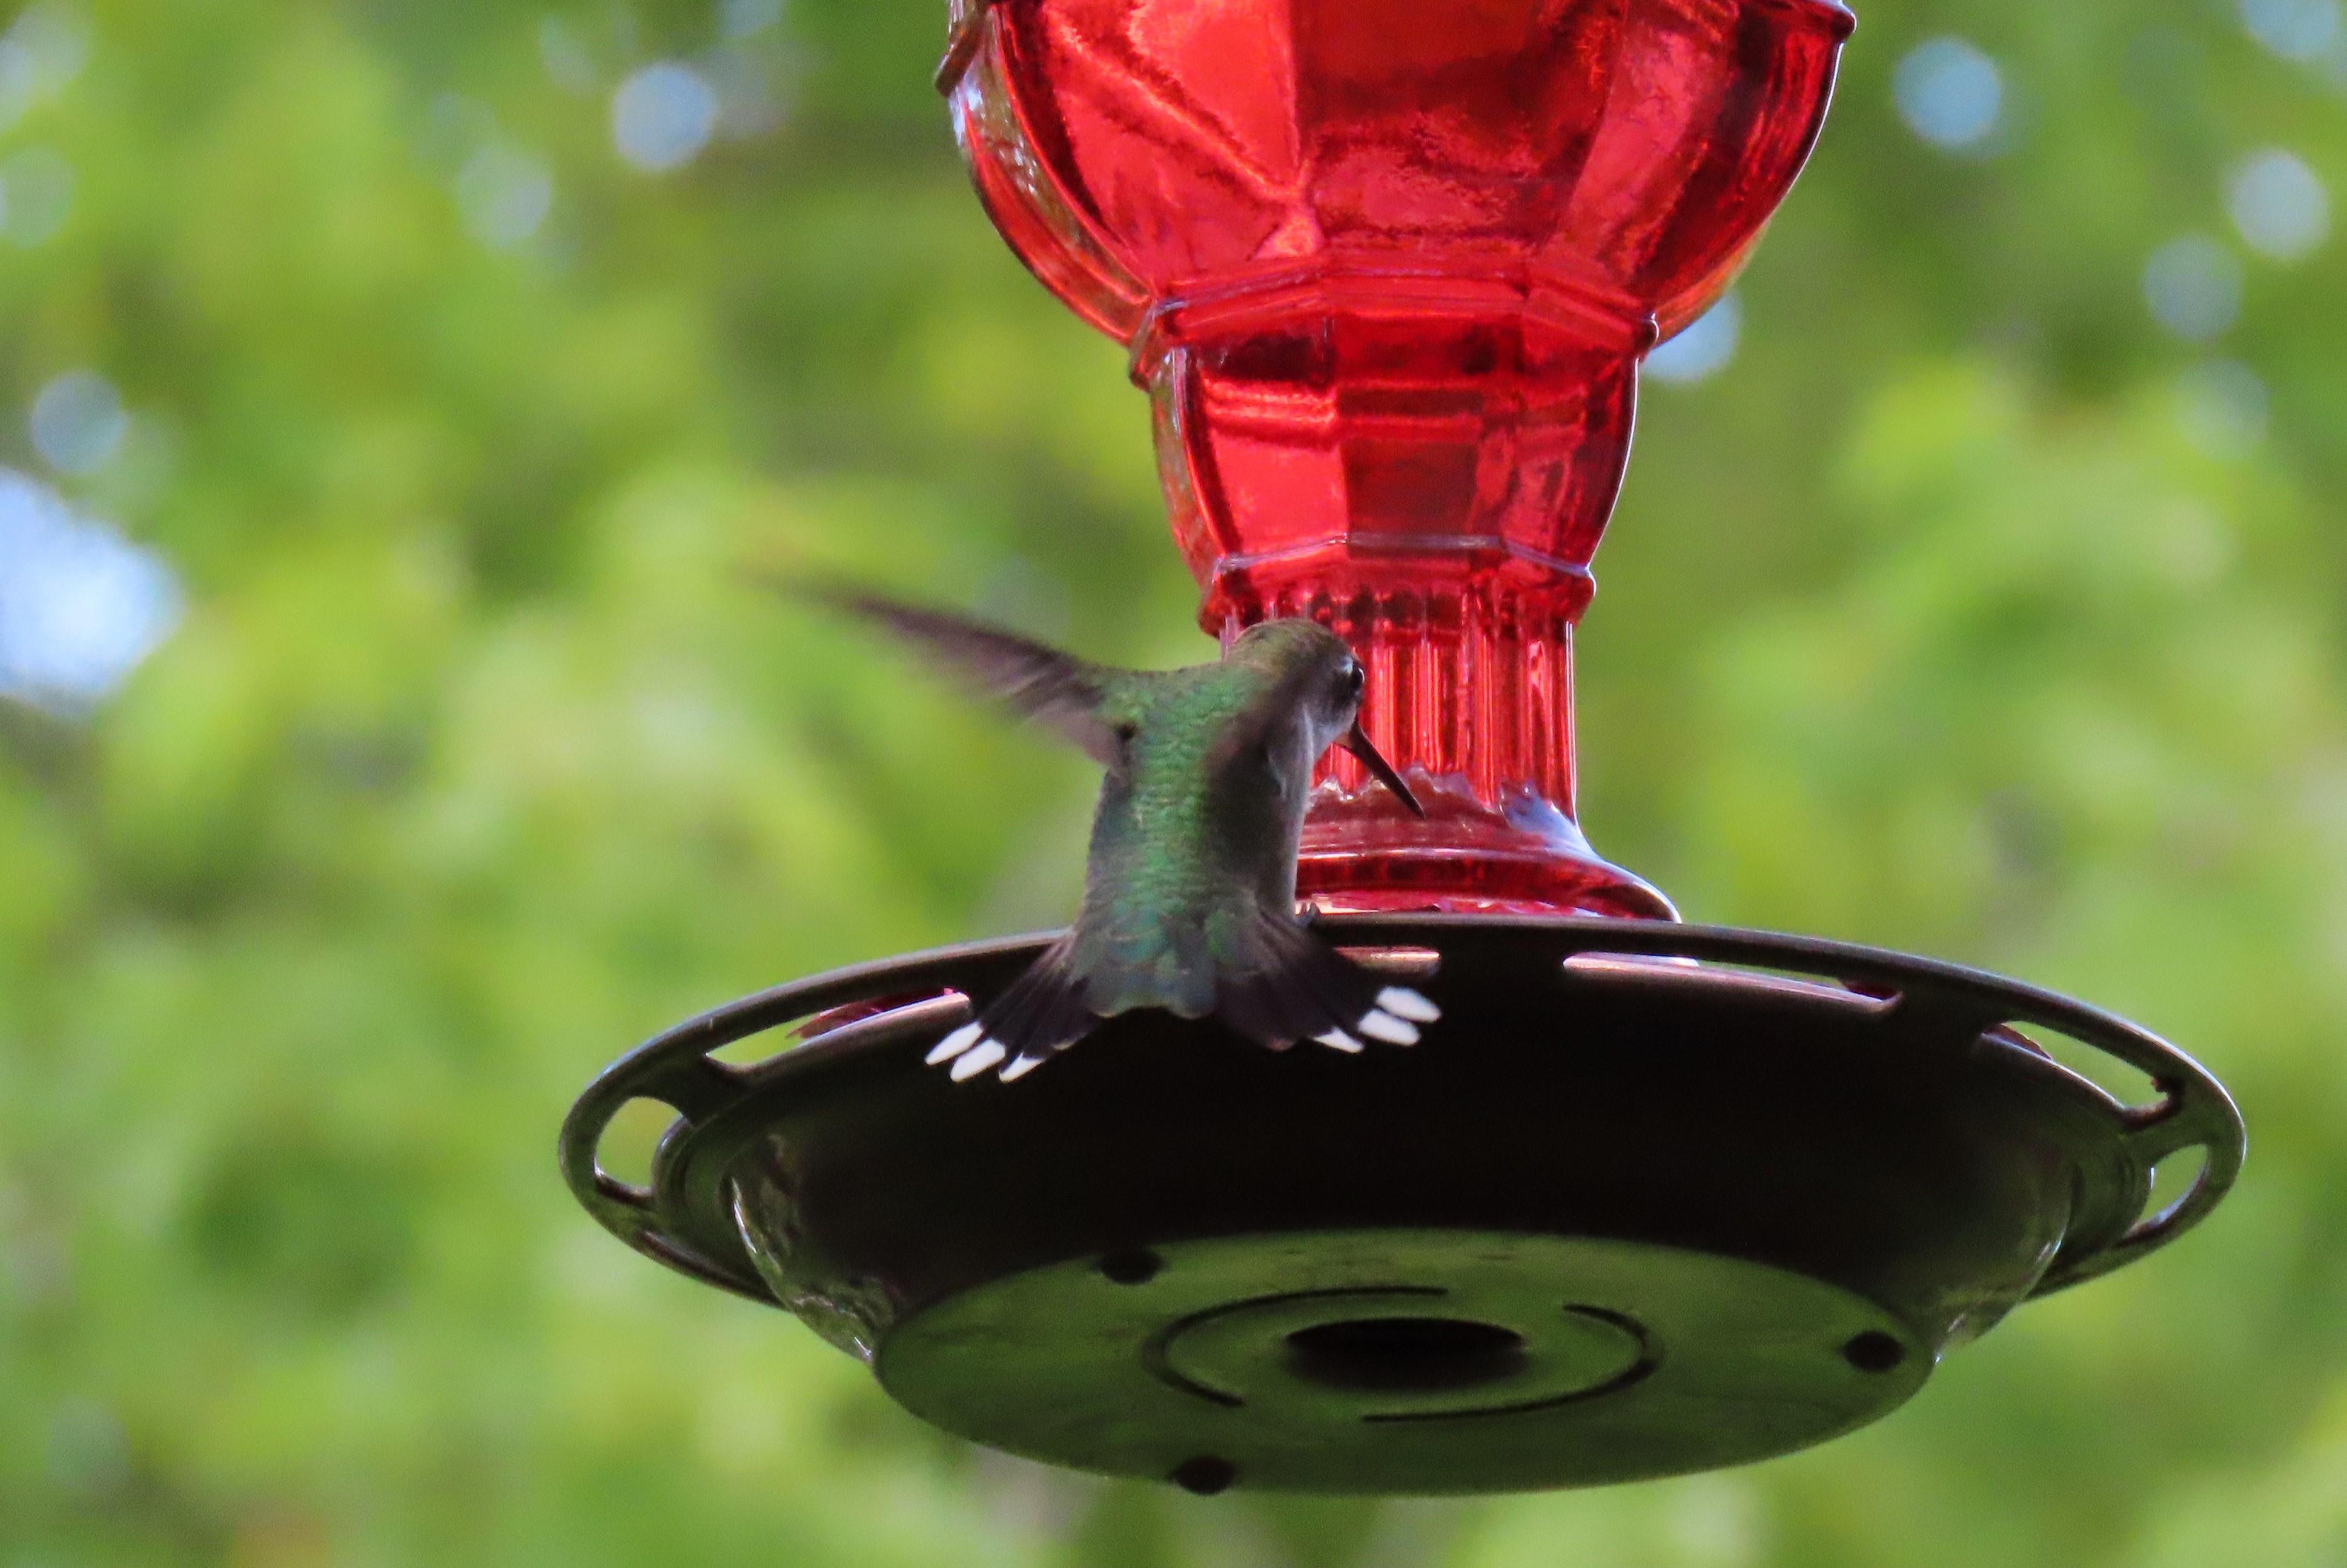 Hummingbird landing on feeder